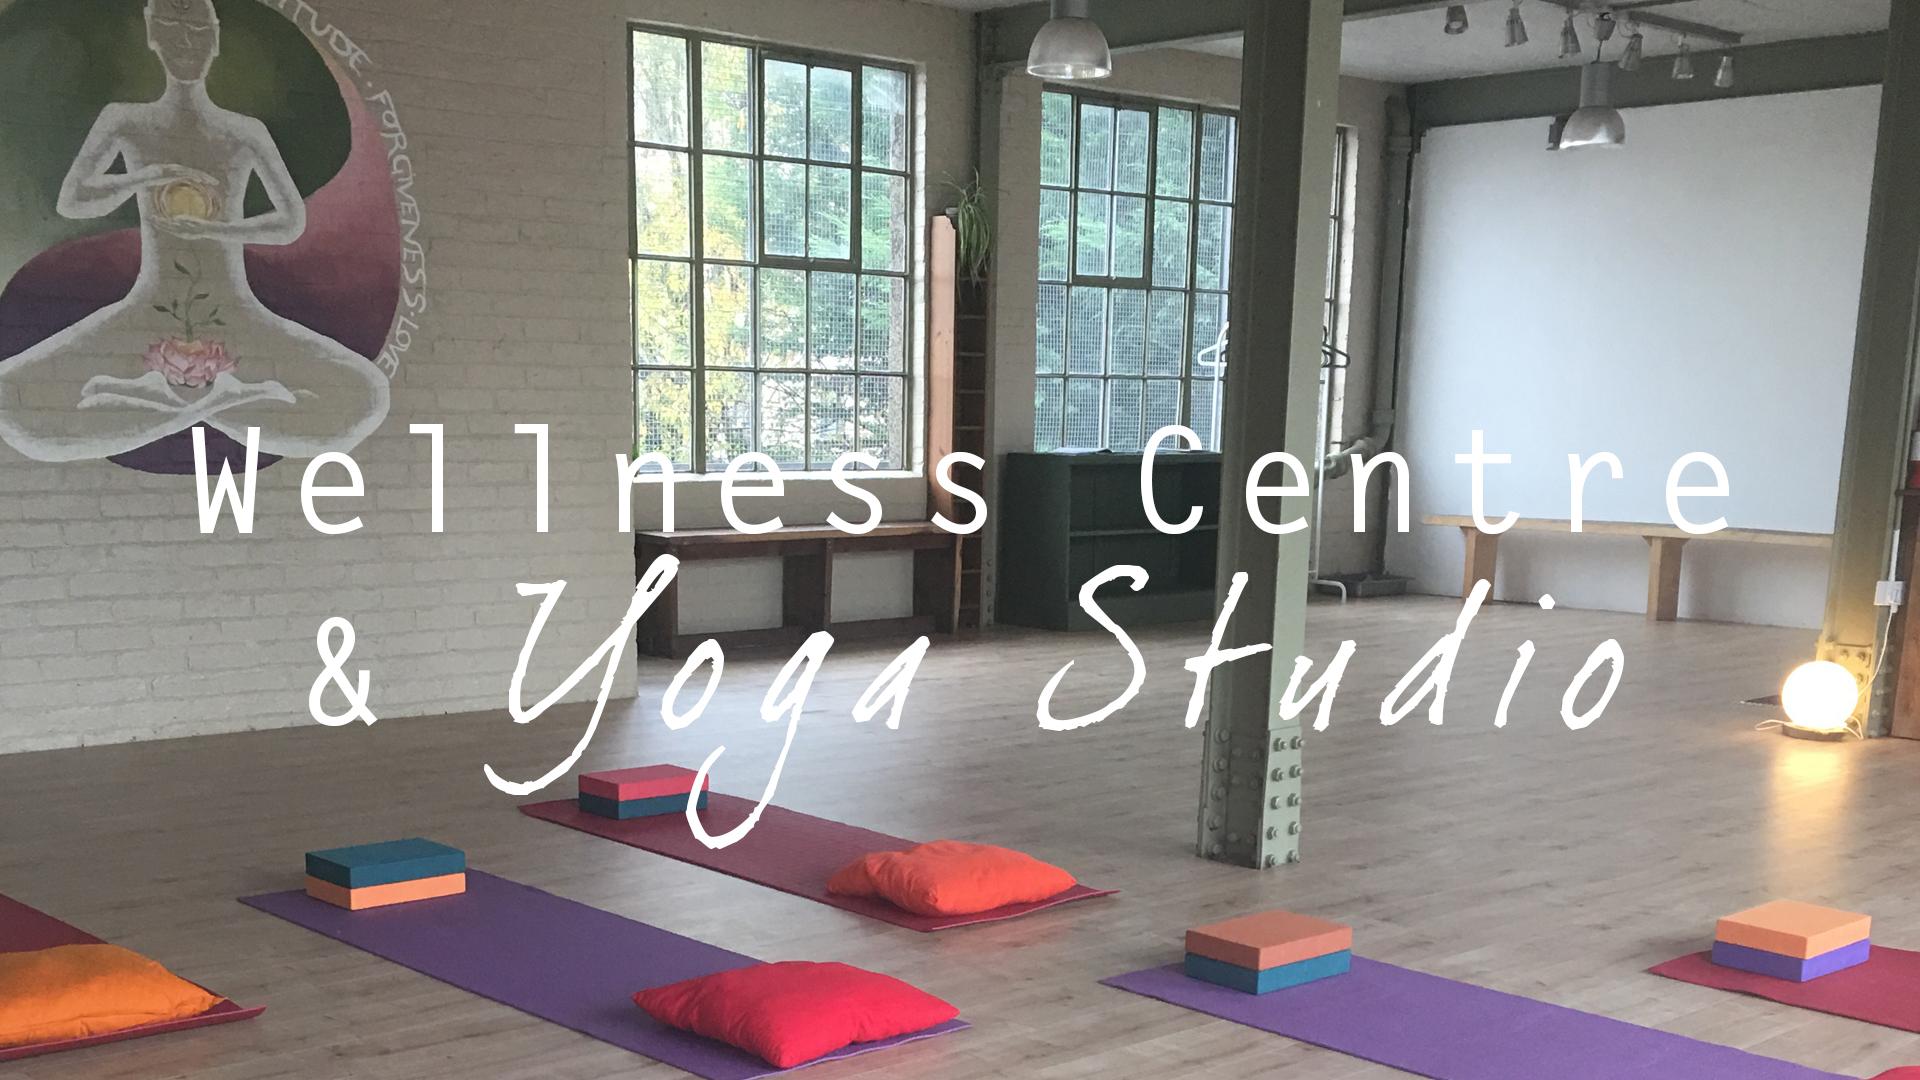 beetroot sauvage edinburgh yoga studio wellness centre